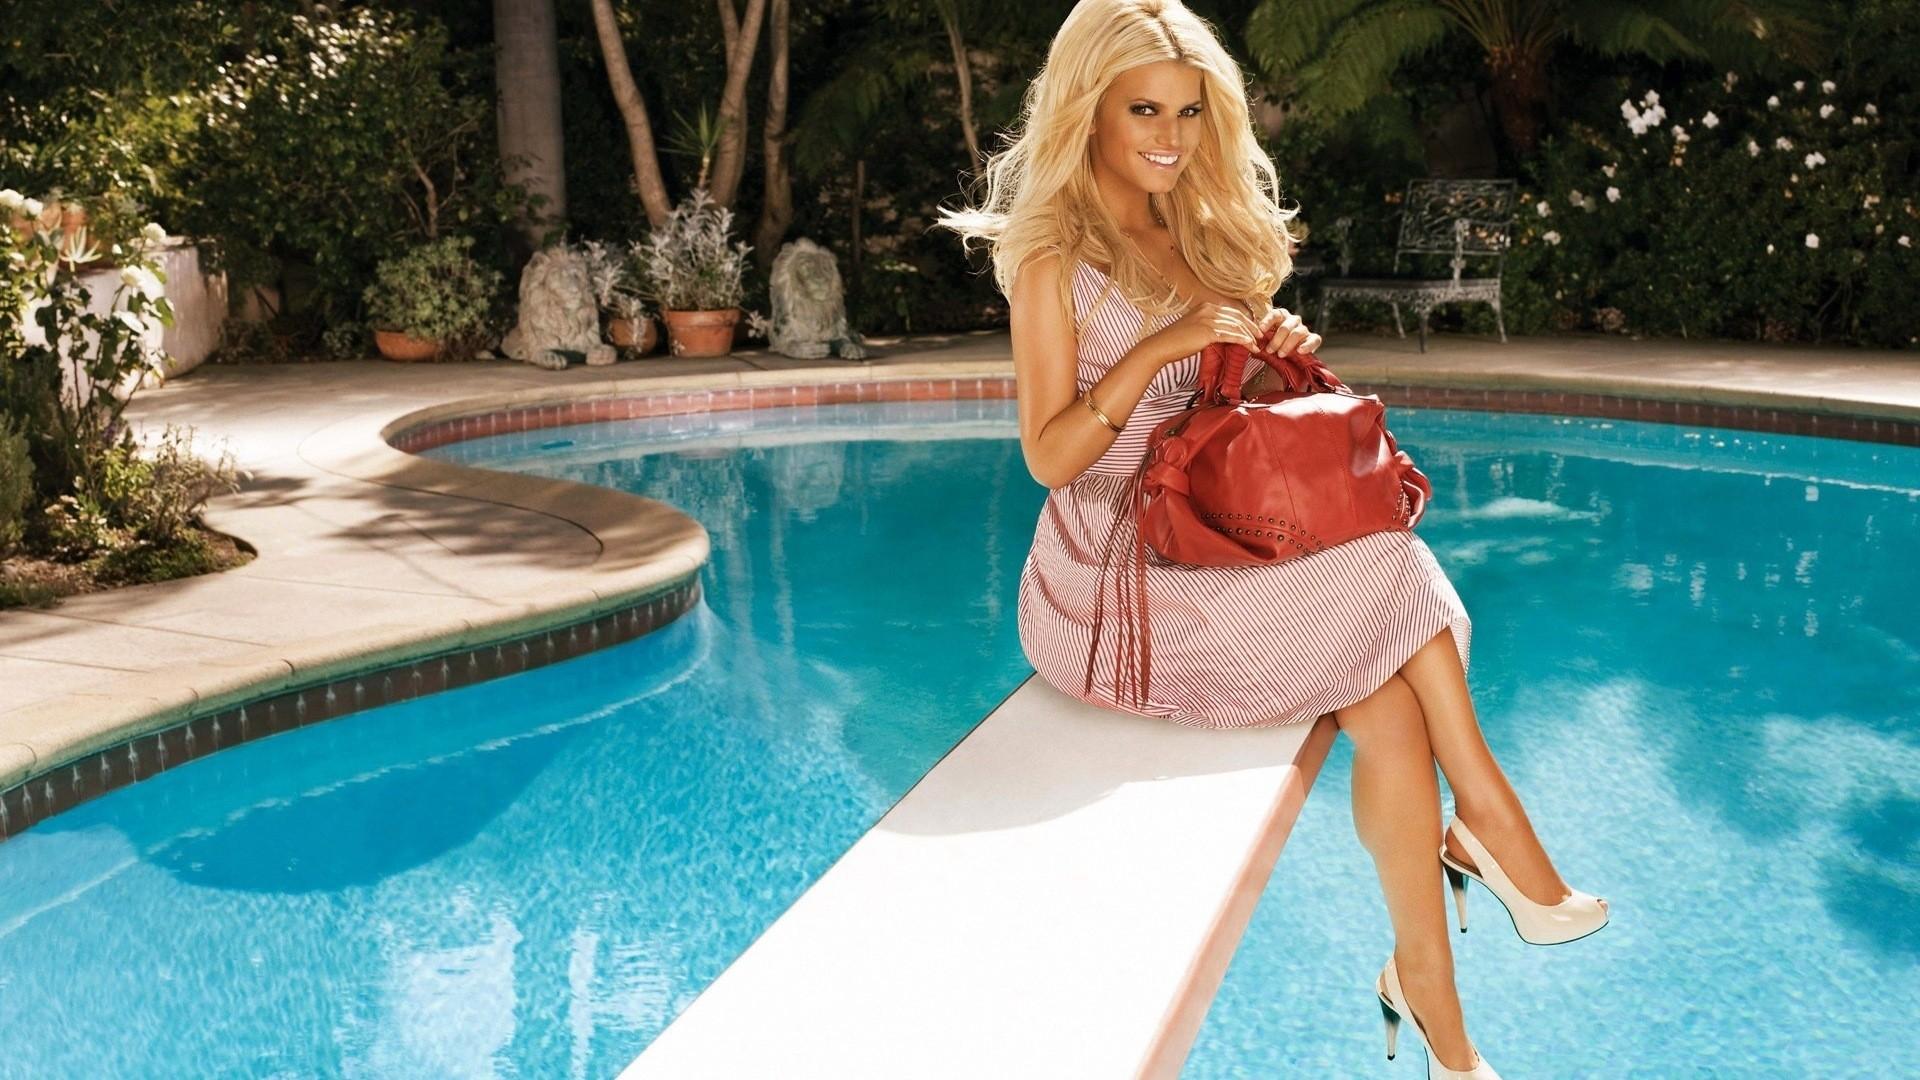 Preventing Pool blonde